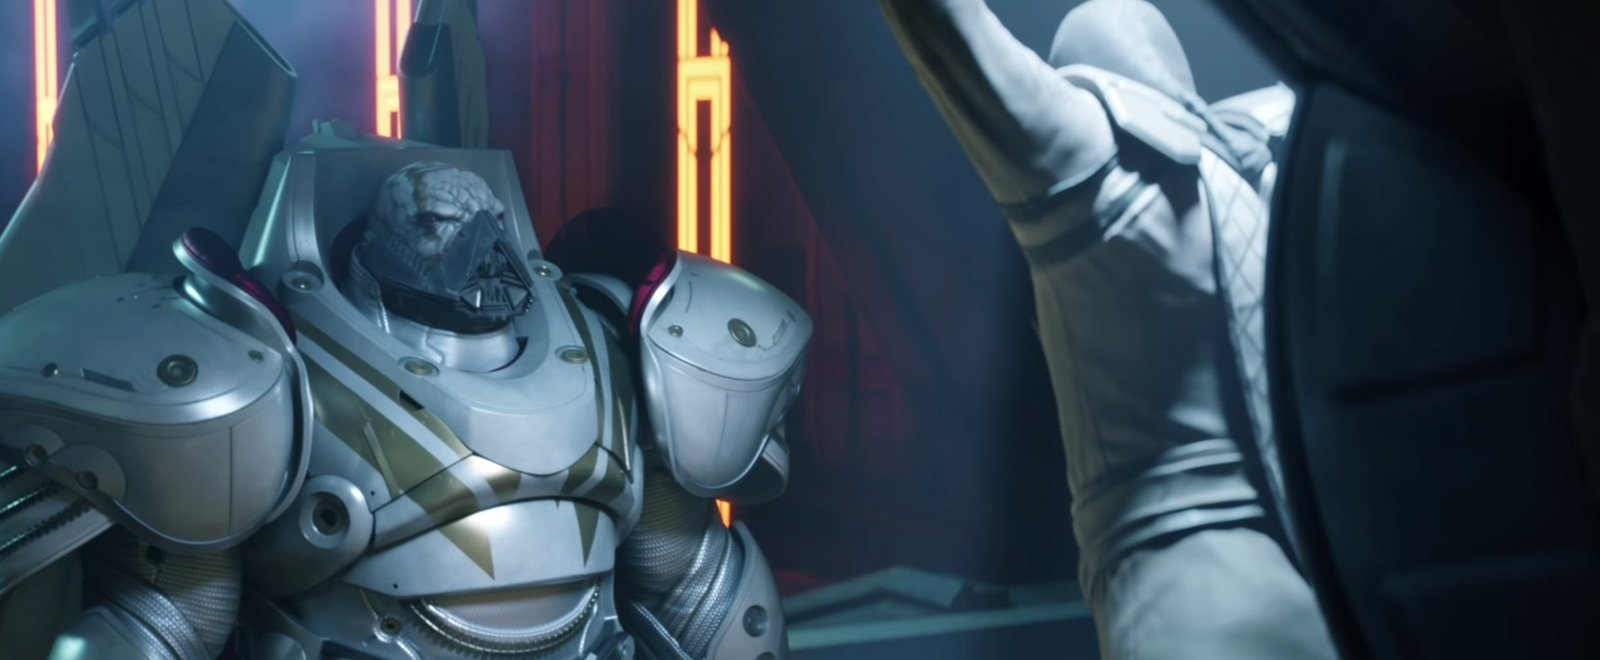 Destiny 2 Screenshot 5